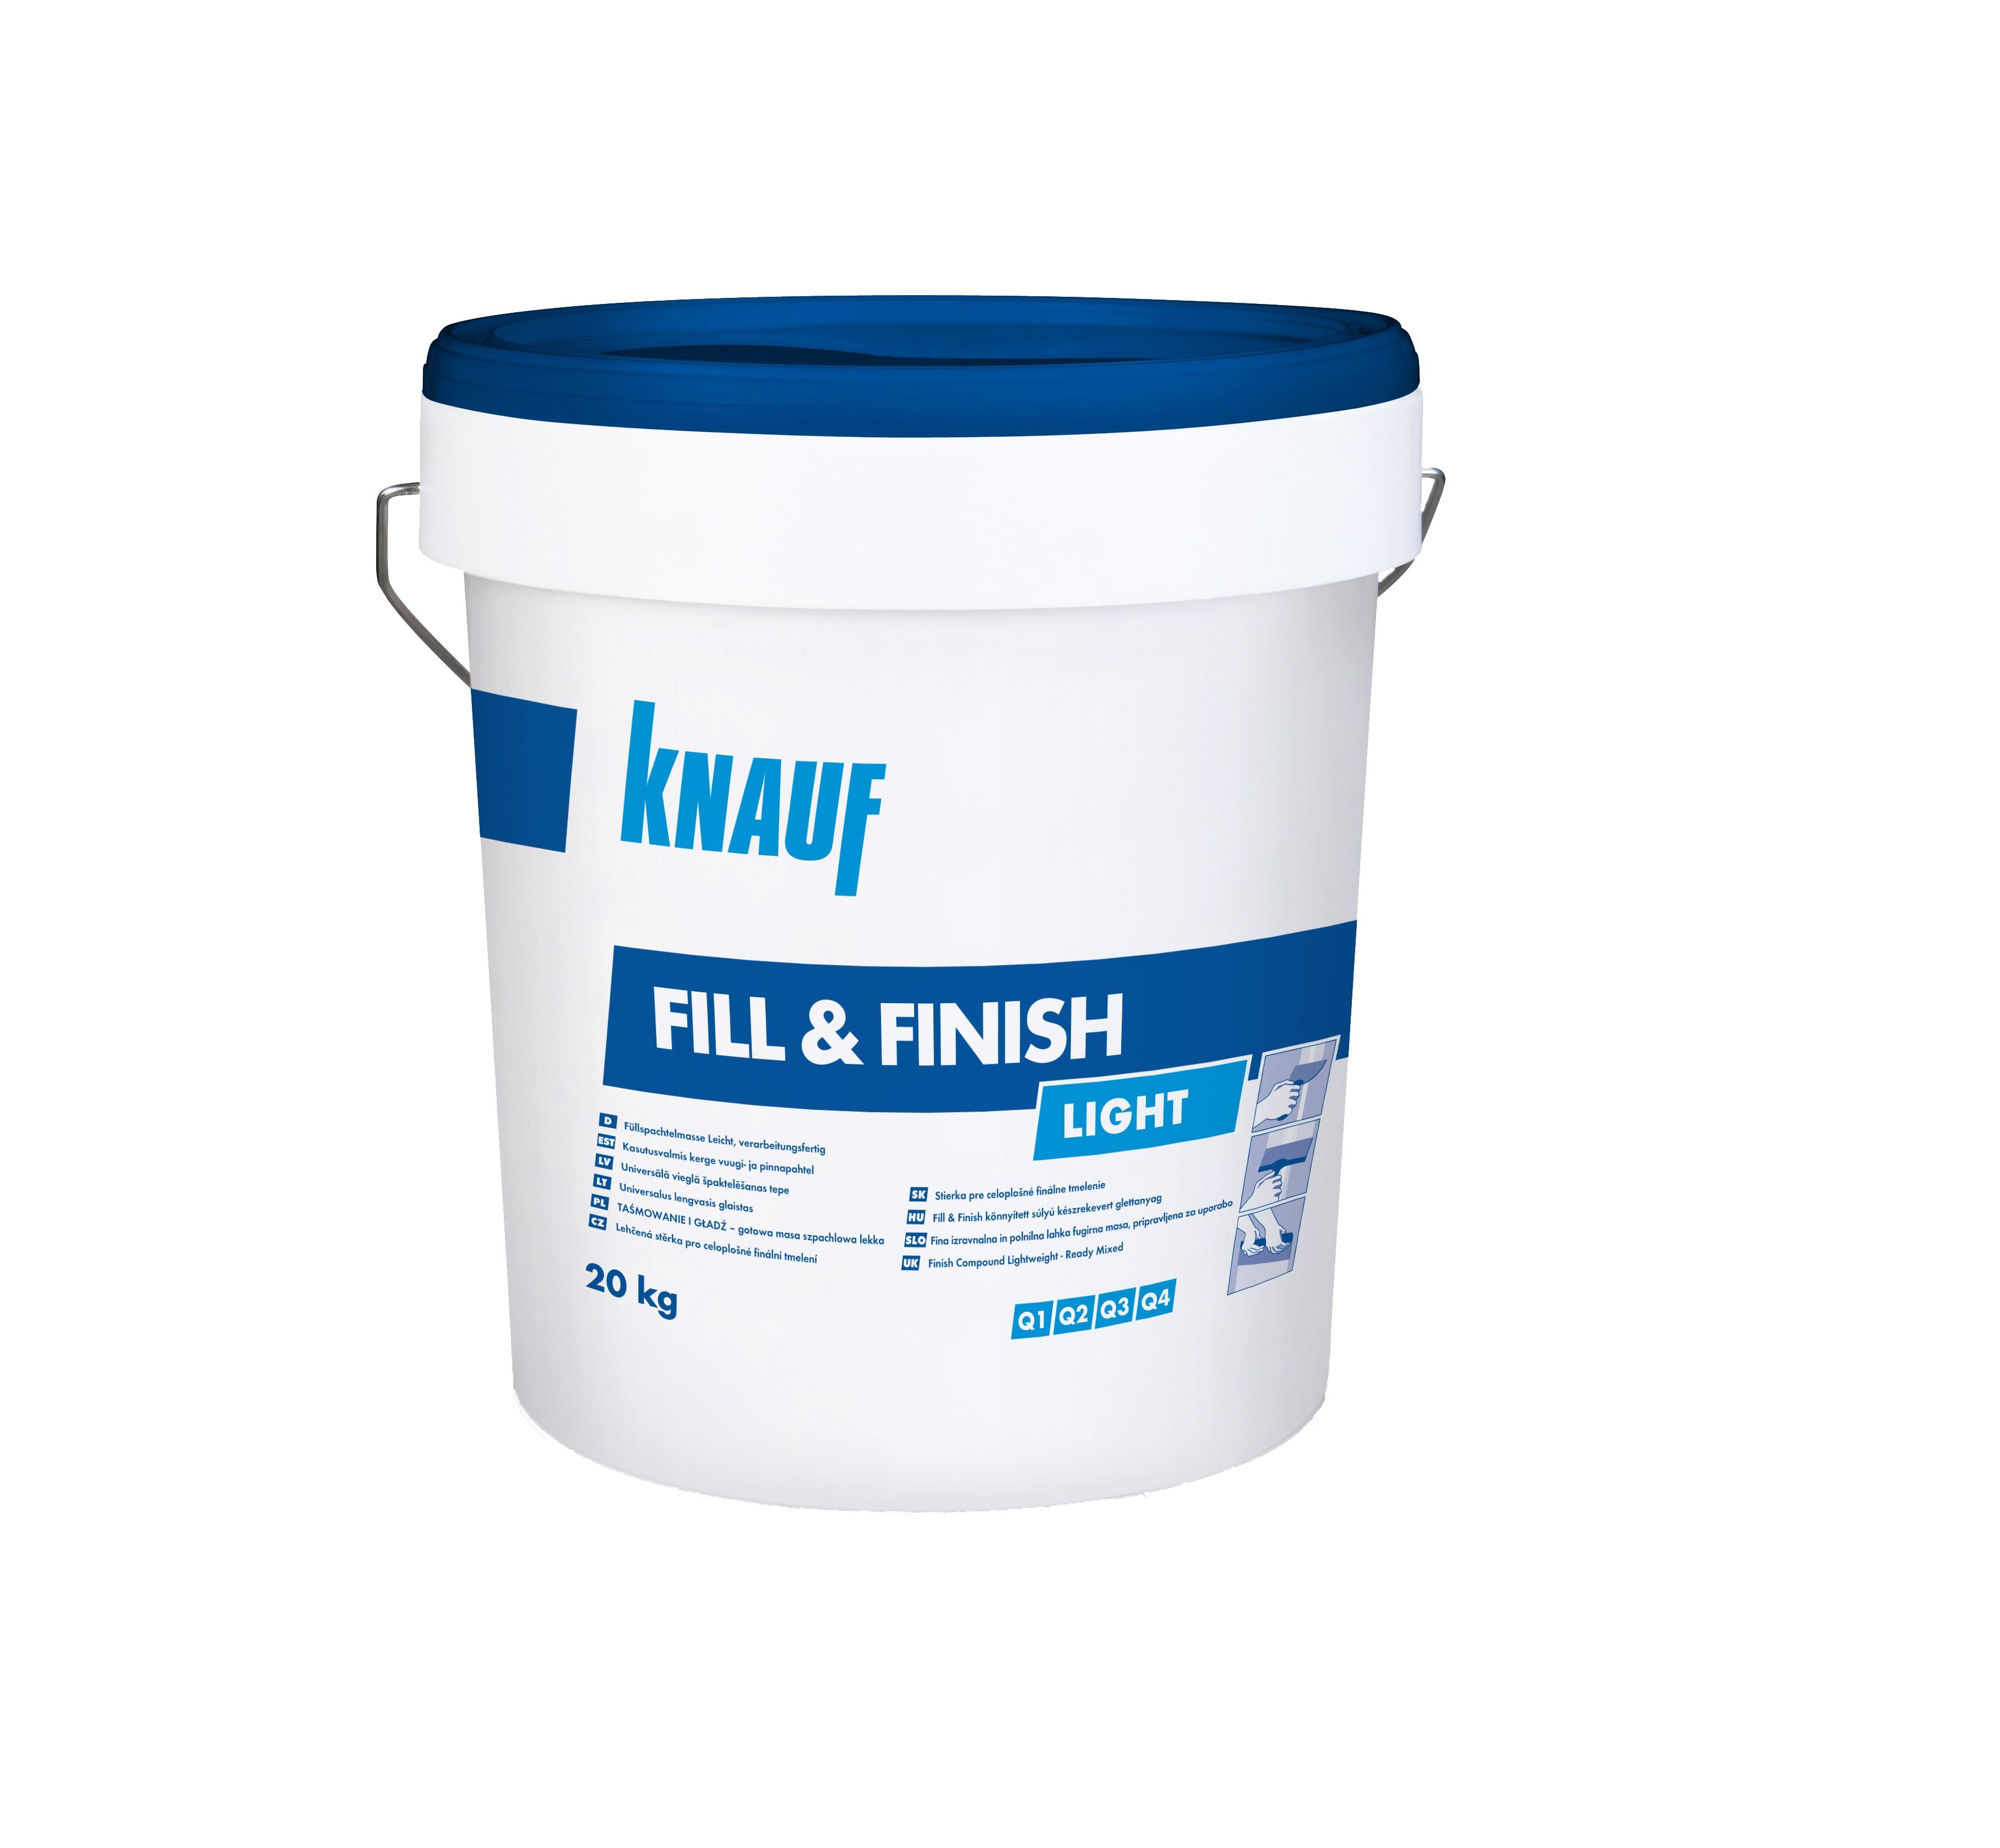 Glet masa za obradu spojeva i površina, FILL i FINISH, 20 kg, KNAUF